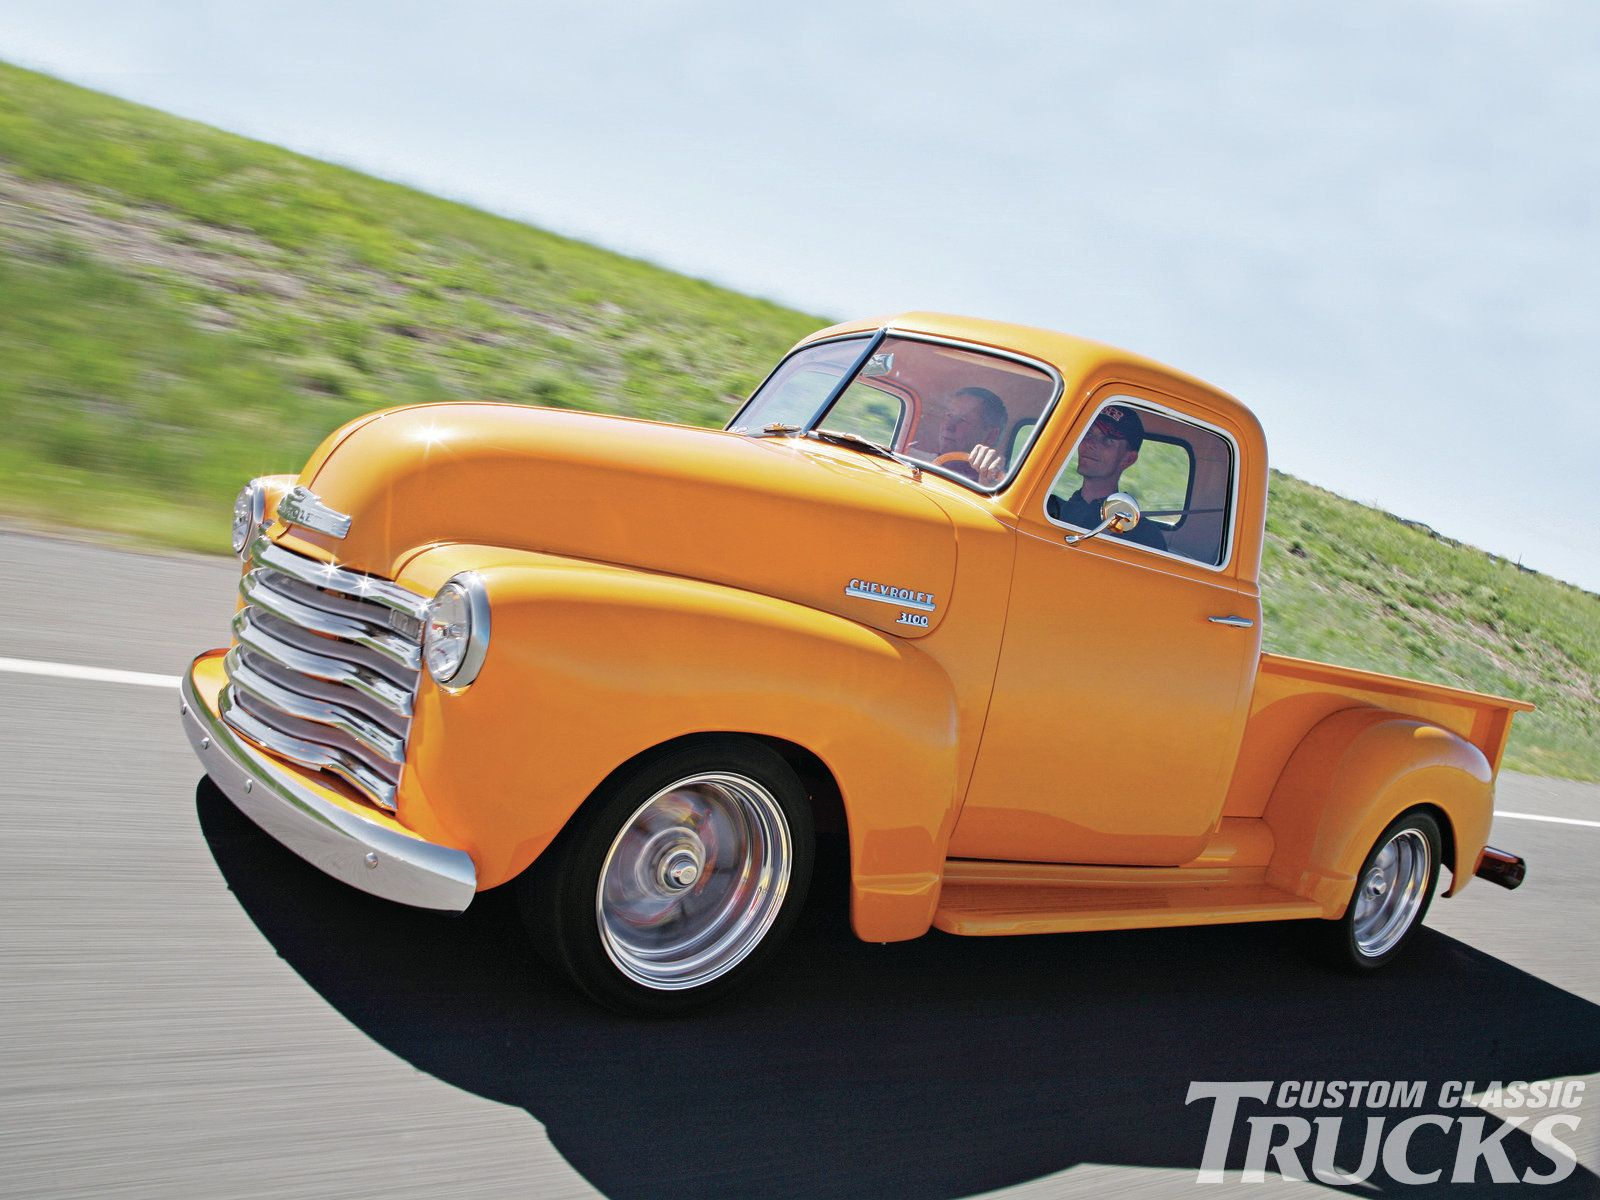 1949 chevy truck | 1949 Chevy/GMC Pickup Truck | Chevy Trucks ...